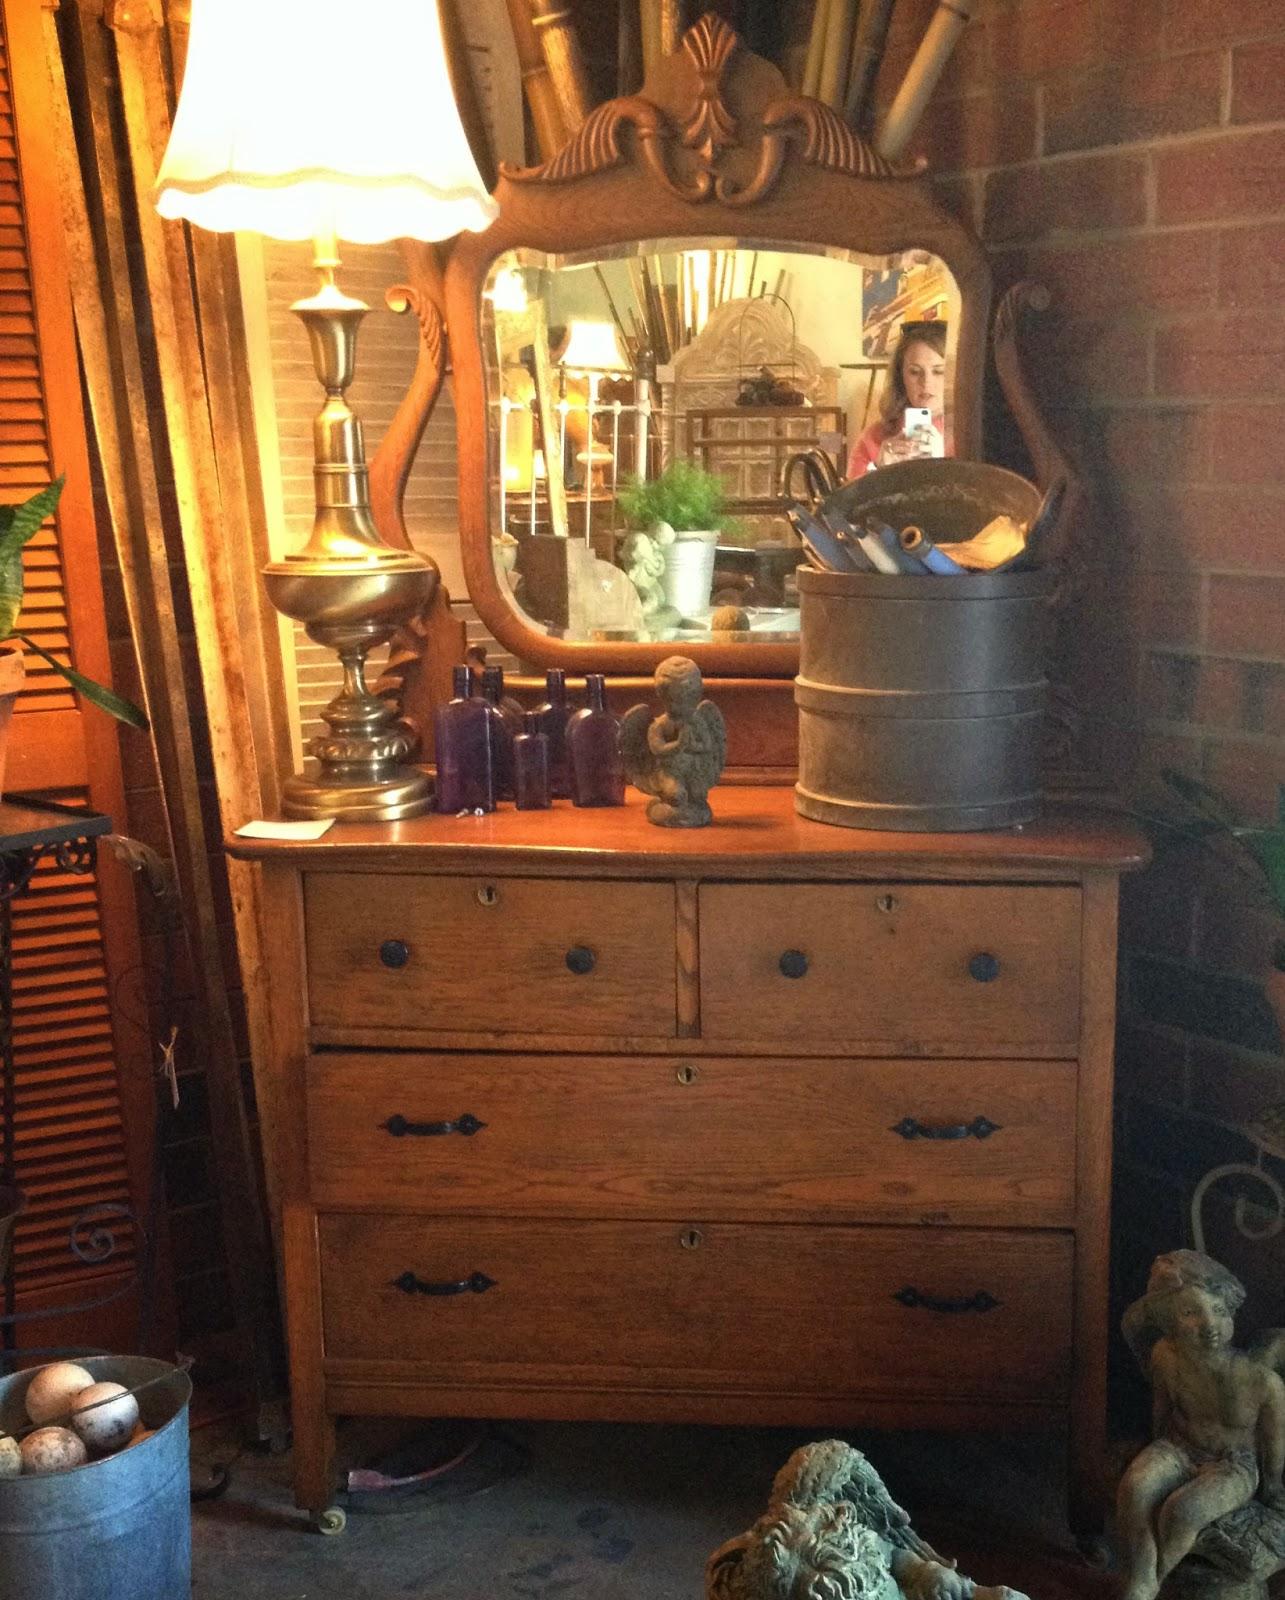 Le Grand 6 Drawer Dresser In Antique White: Nursery Update {Refinished Dresser}